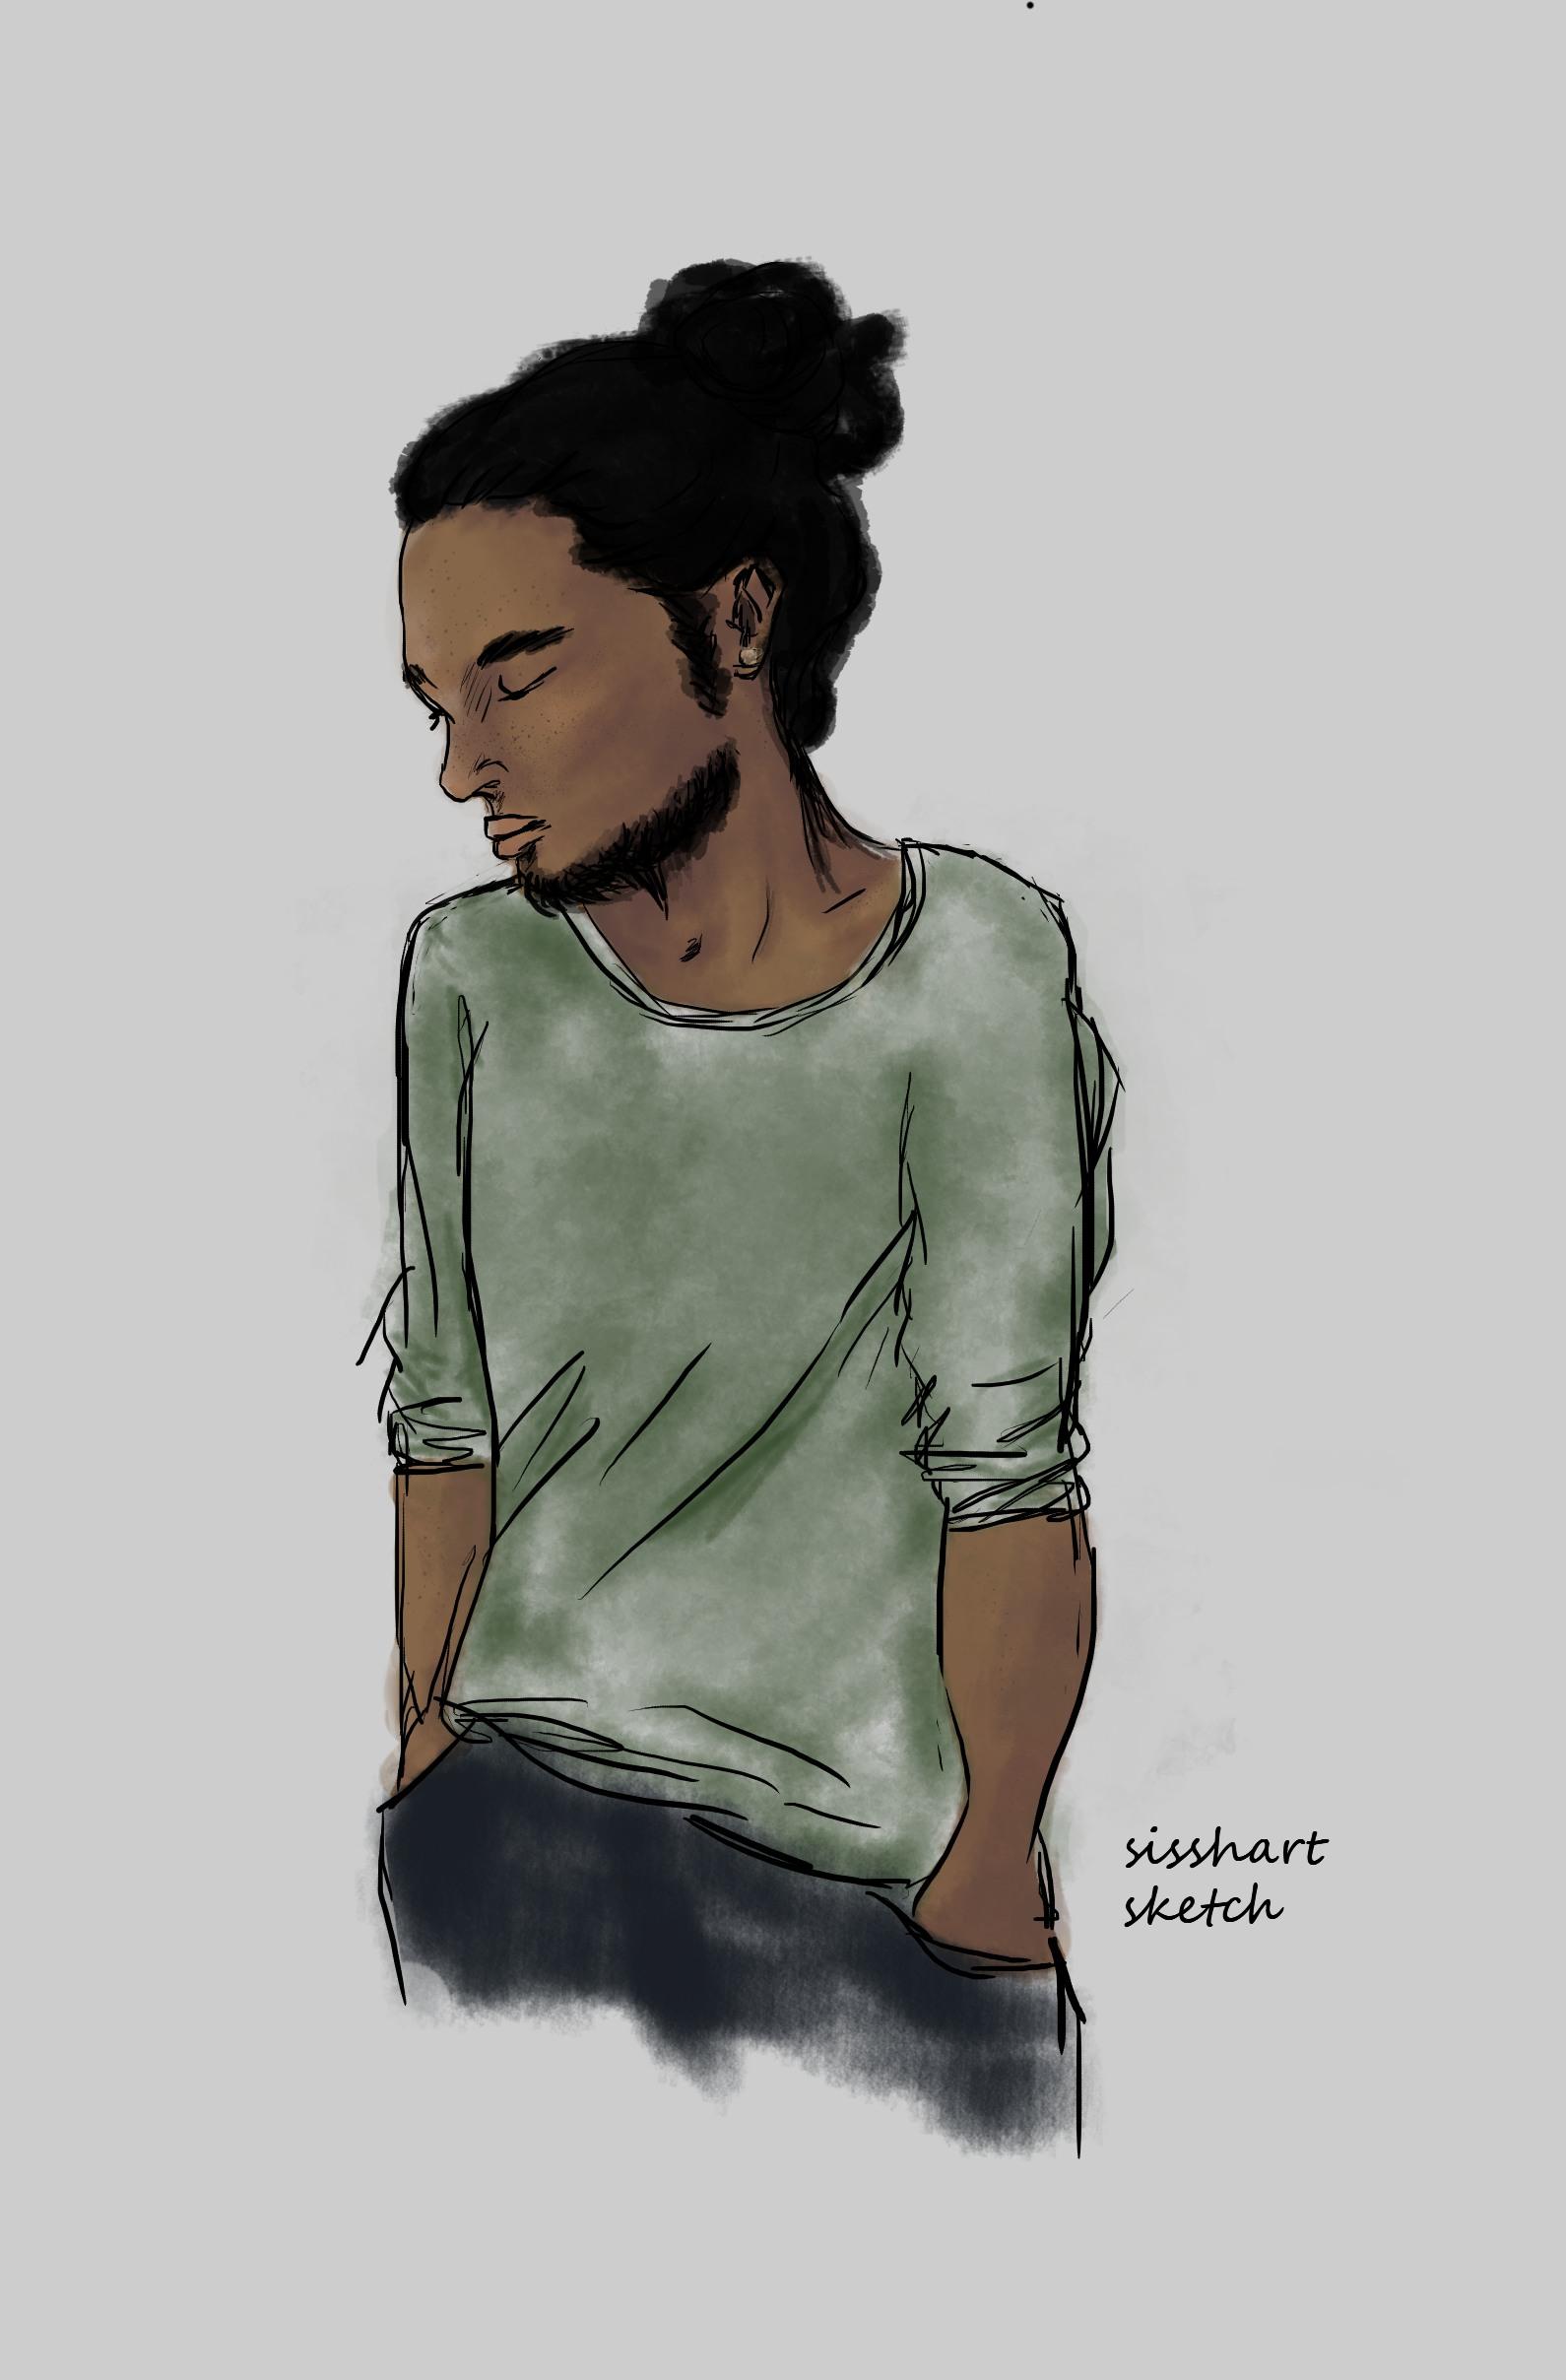 Male character sketch   Sissh Art   The Black Lion Journal   The Black Lion   Black Lion